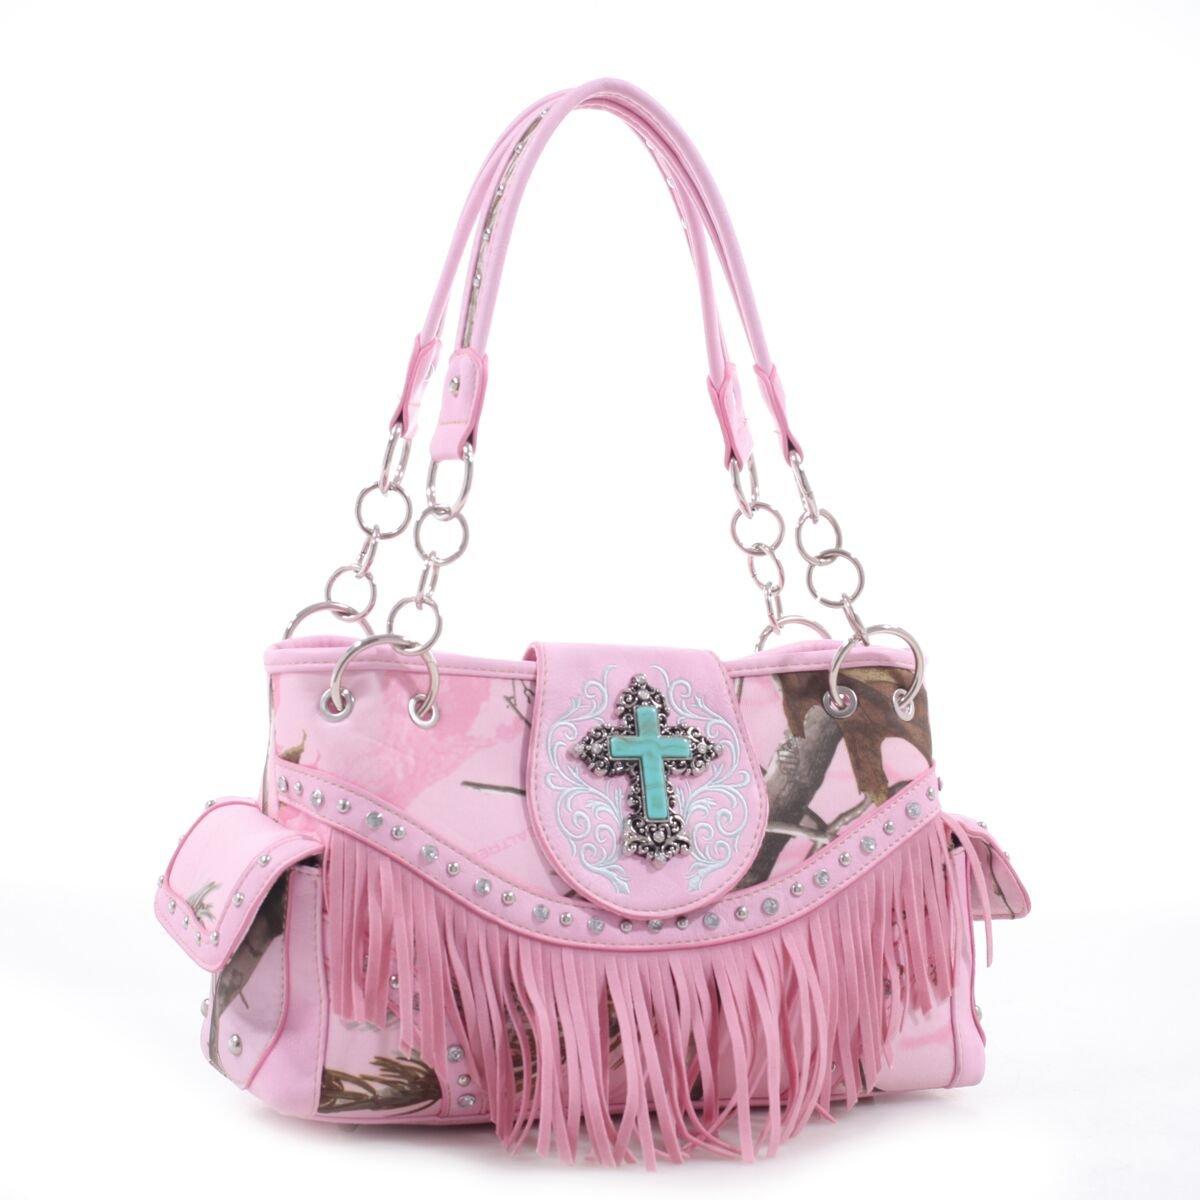 Realtree® Fringed Studded Turquoise Cross Shoulder Bag